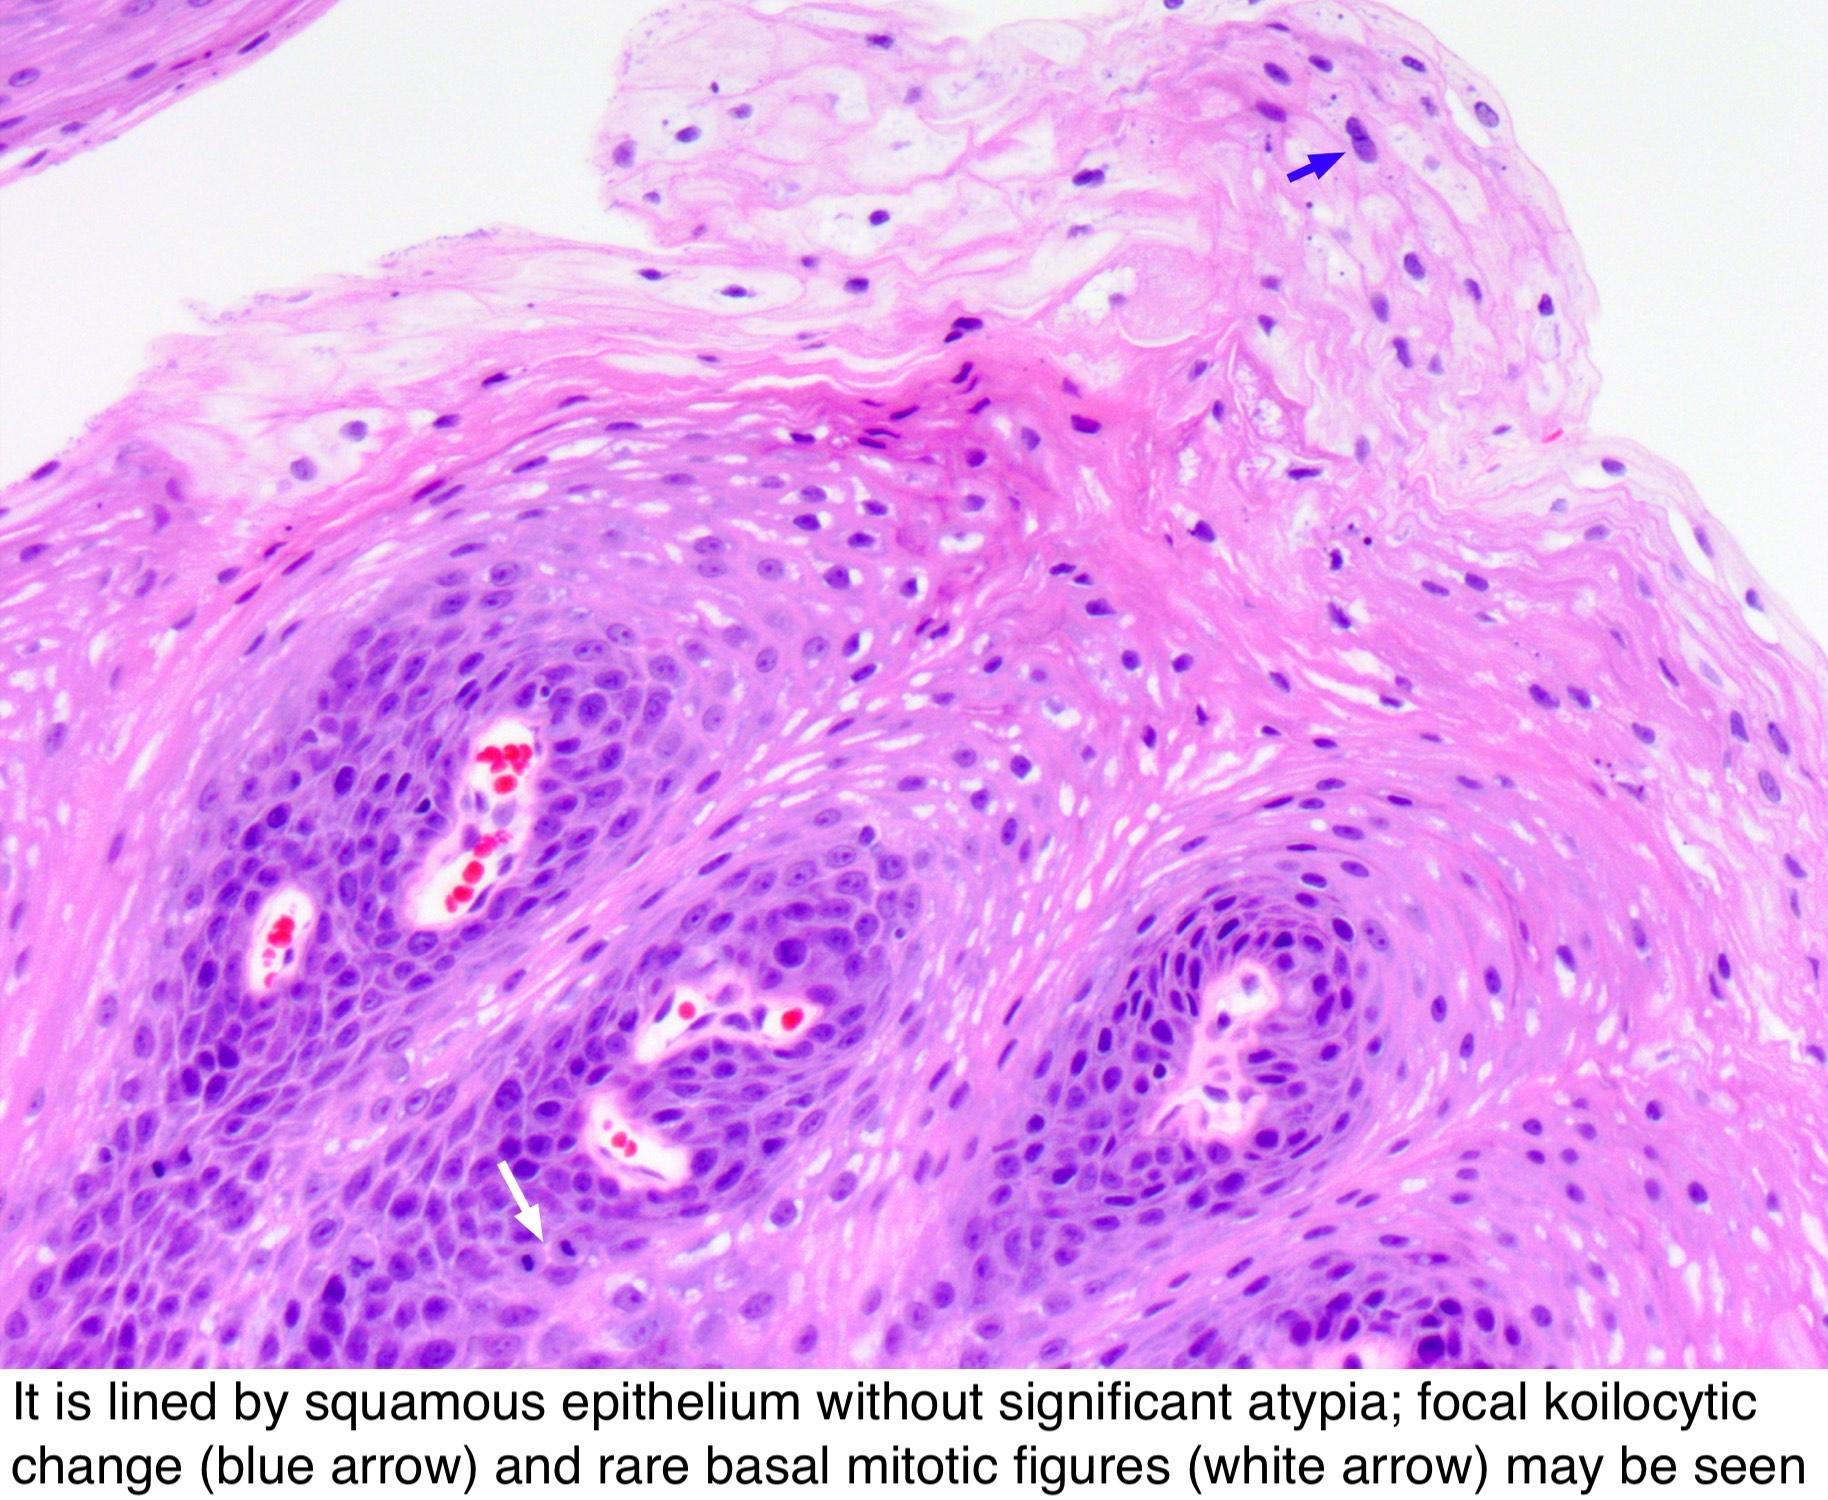 squamous papilloma with mild atypia)